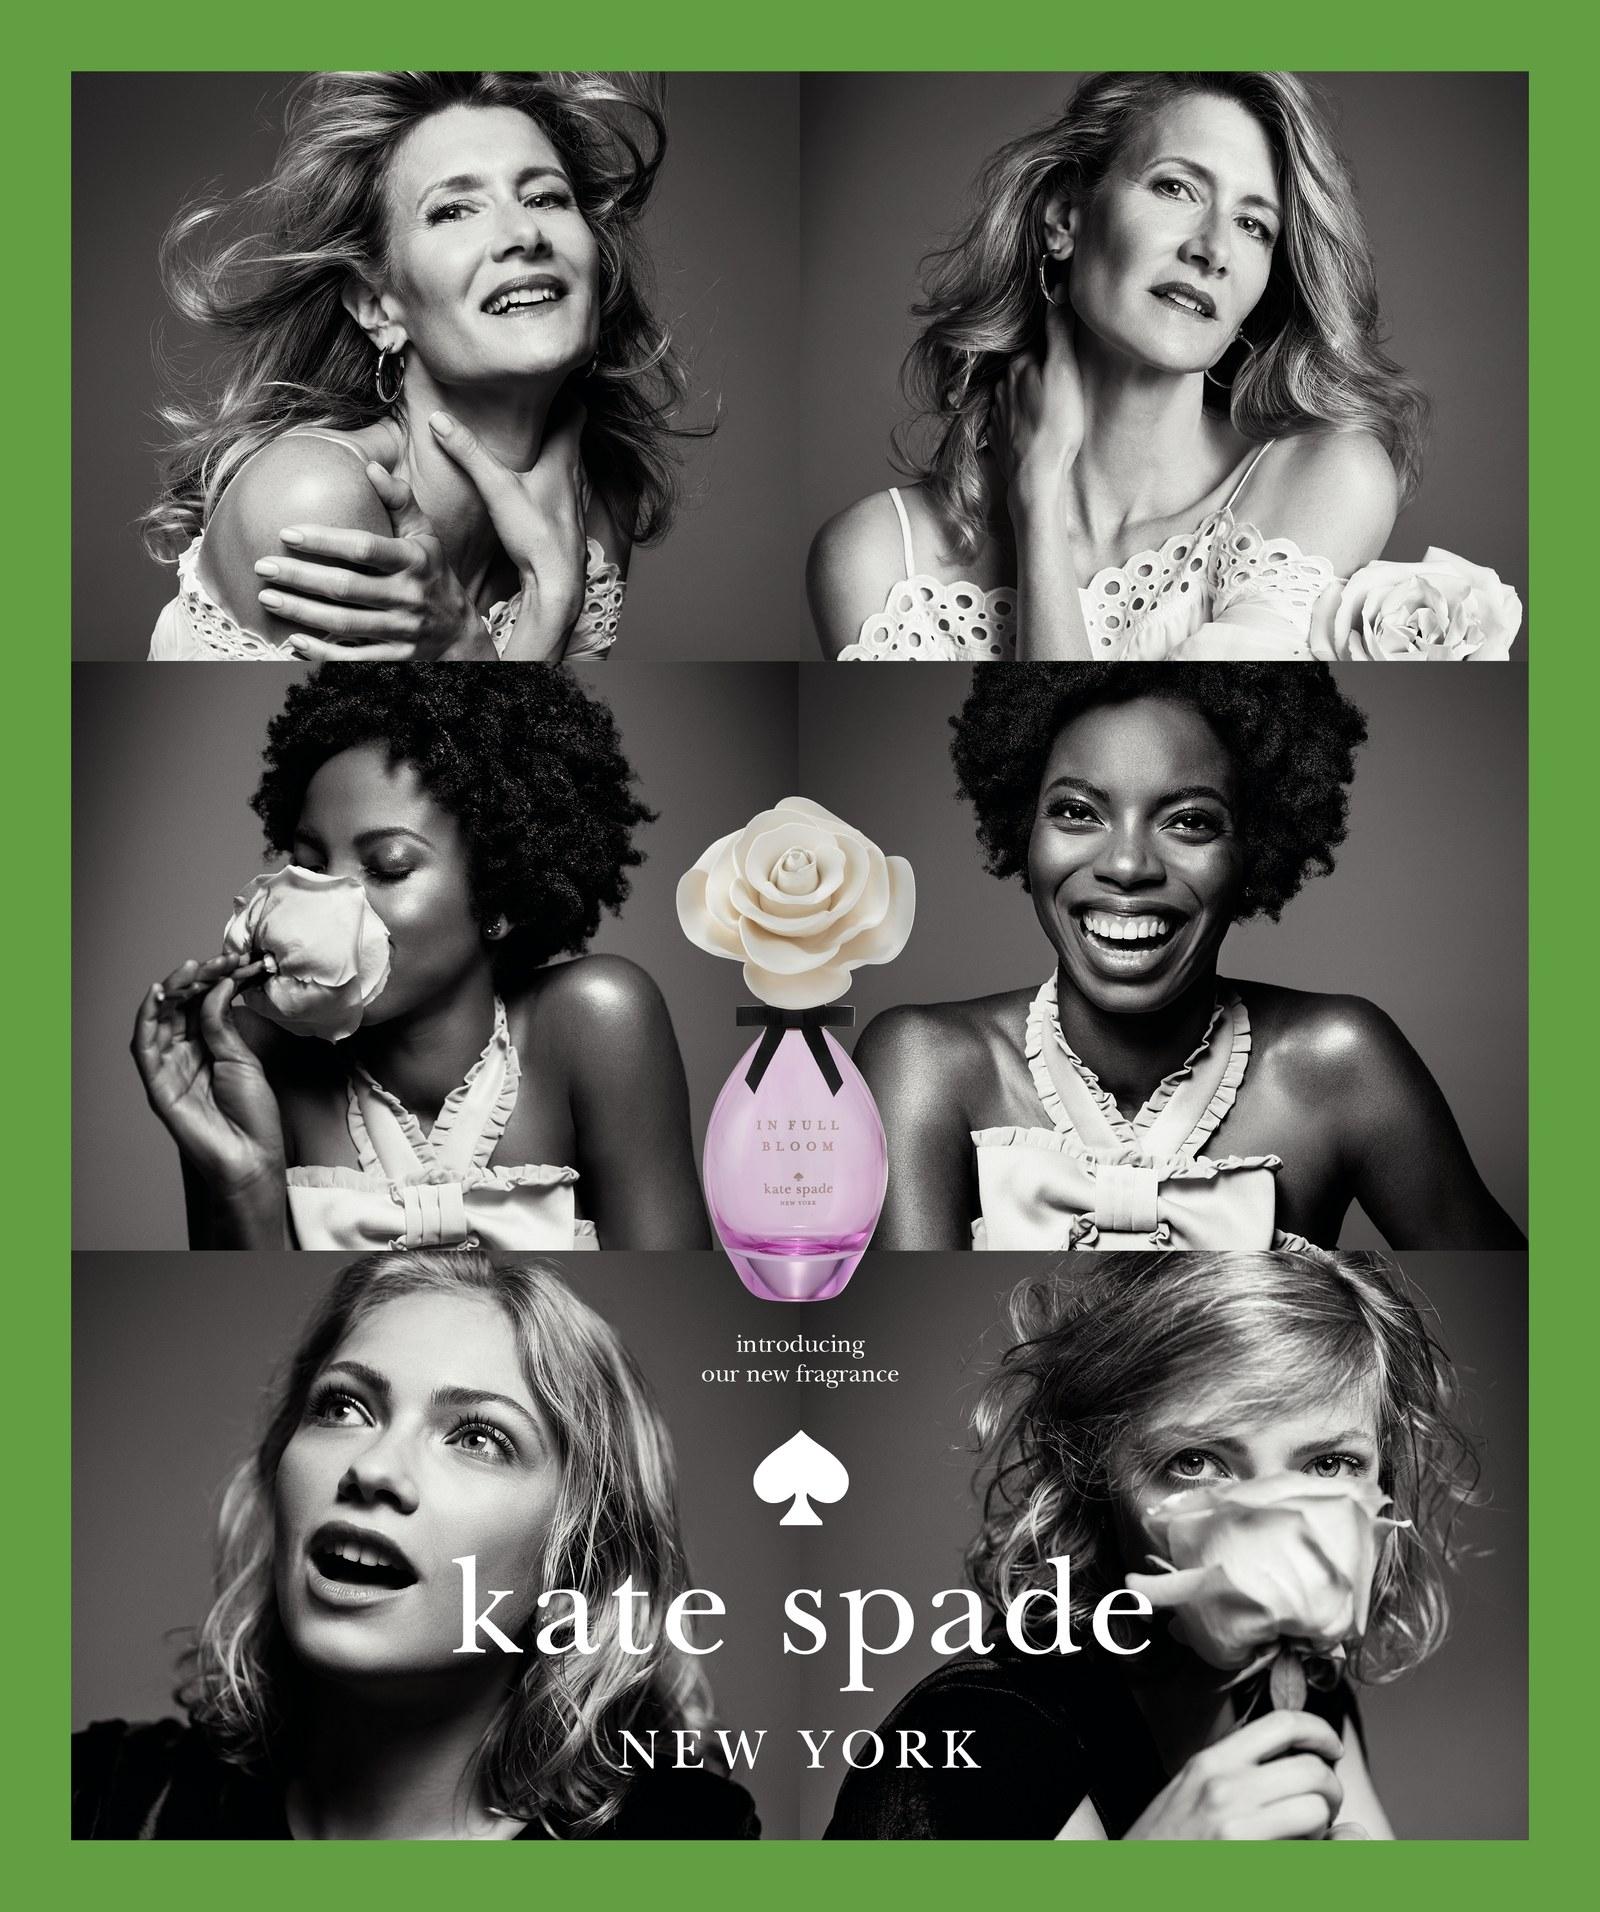 Kate-Spade-In-Full-Bloom-Blush-Banner